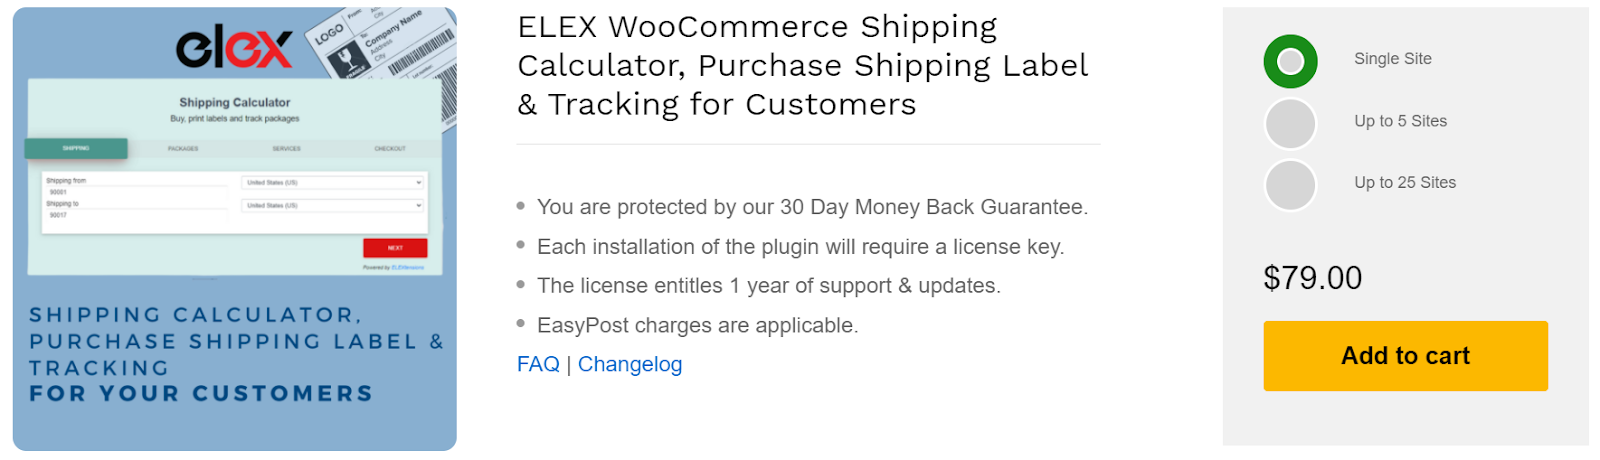 WooCommerce Shipping Calculator, woocommerce shipping plugins